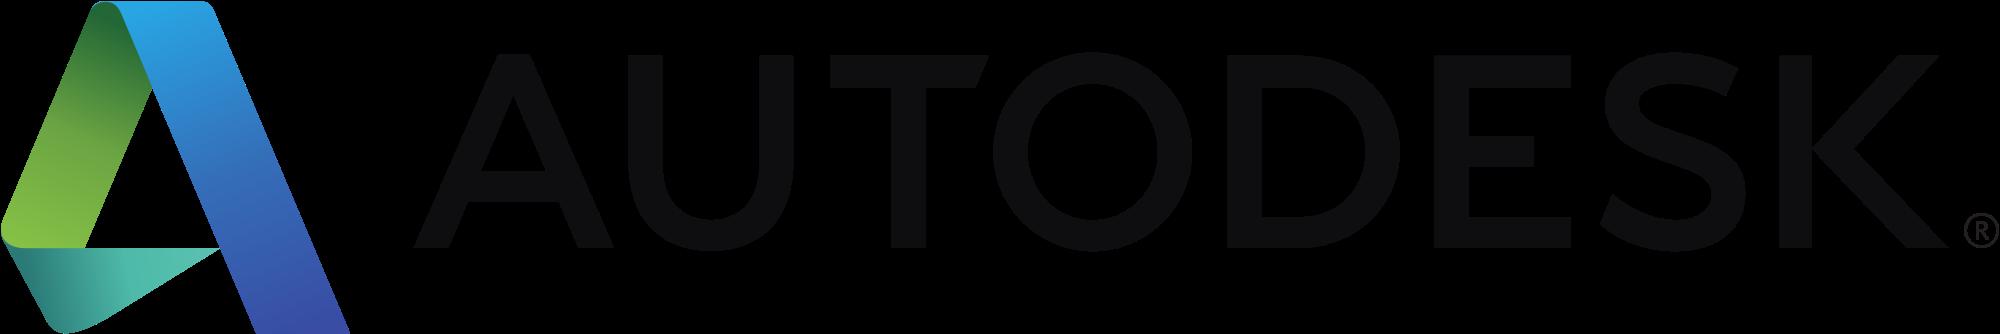 autodesk-logo-png-open-2000